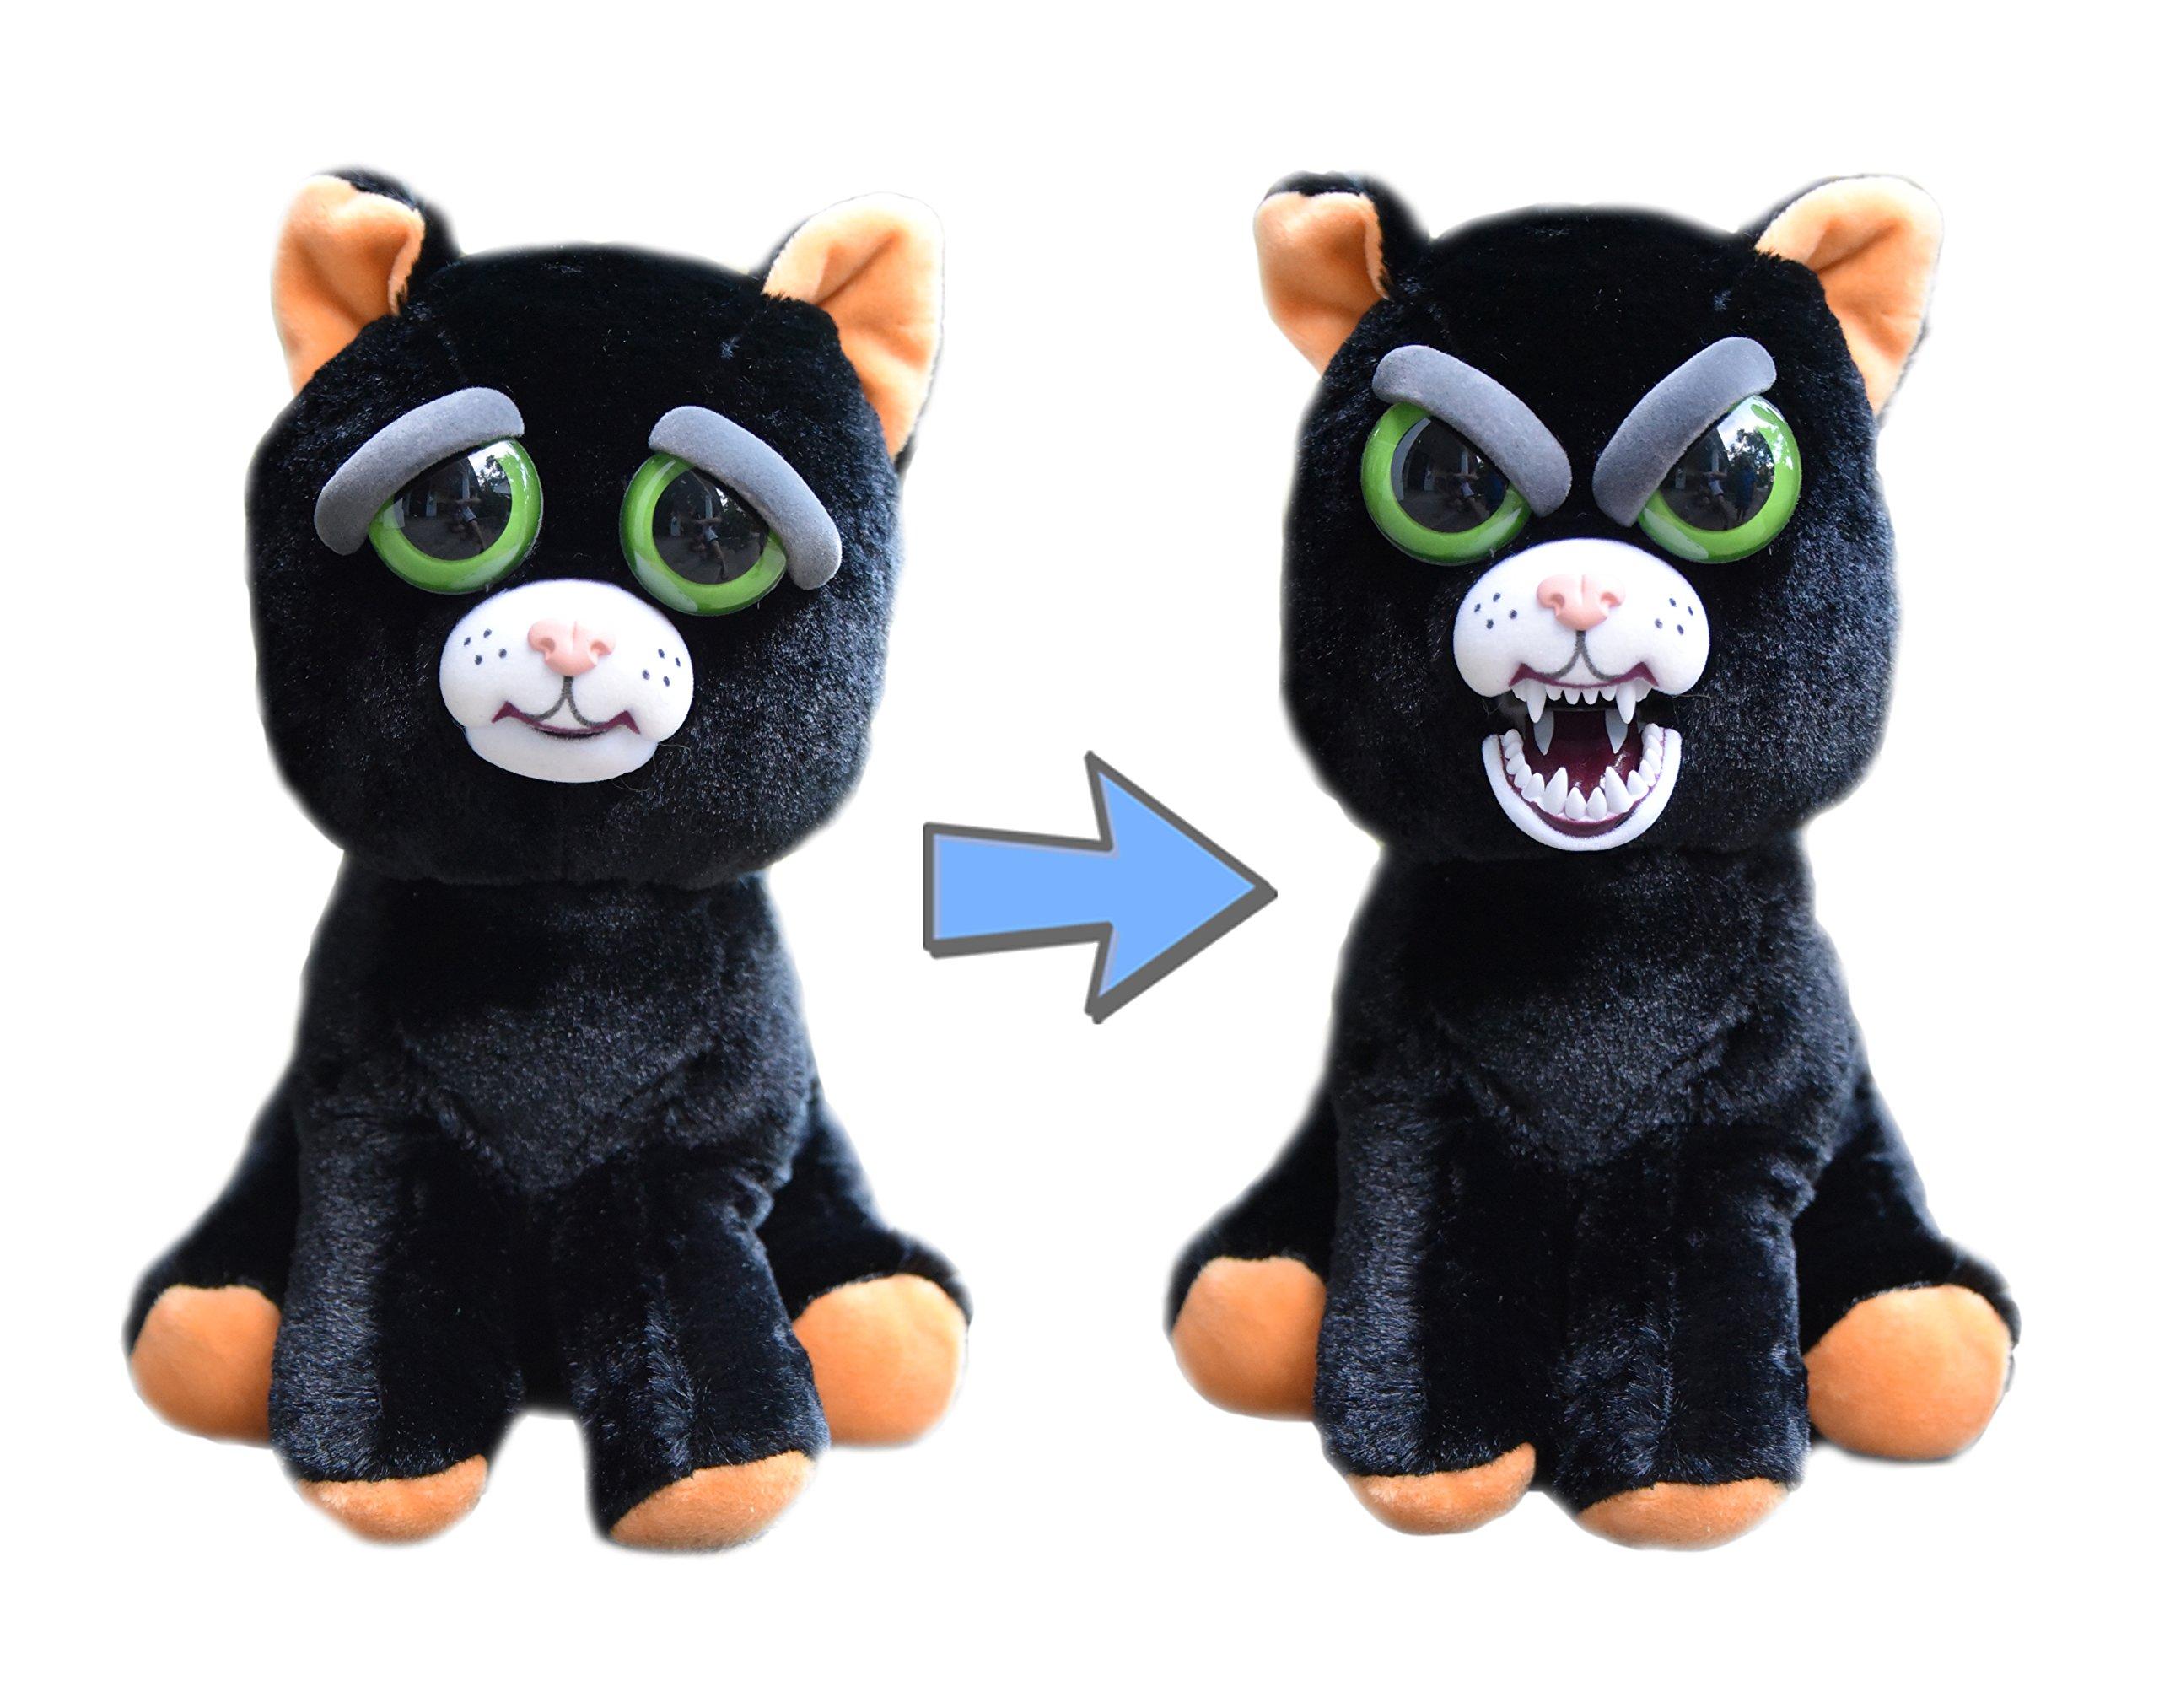 Feisty Pets William Mark Black Cat: Katy Cobweb Stuffed Attitude Plush Animal by Feisty Pets